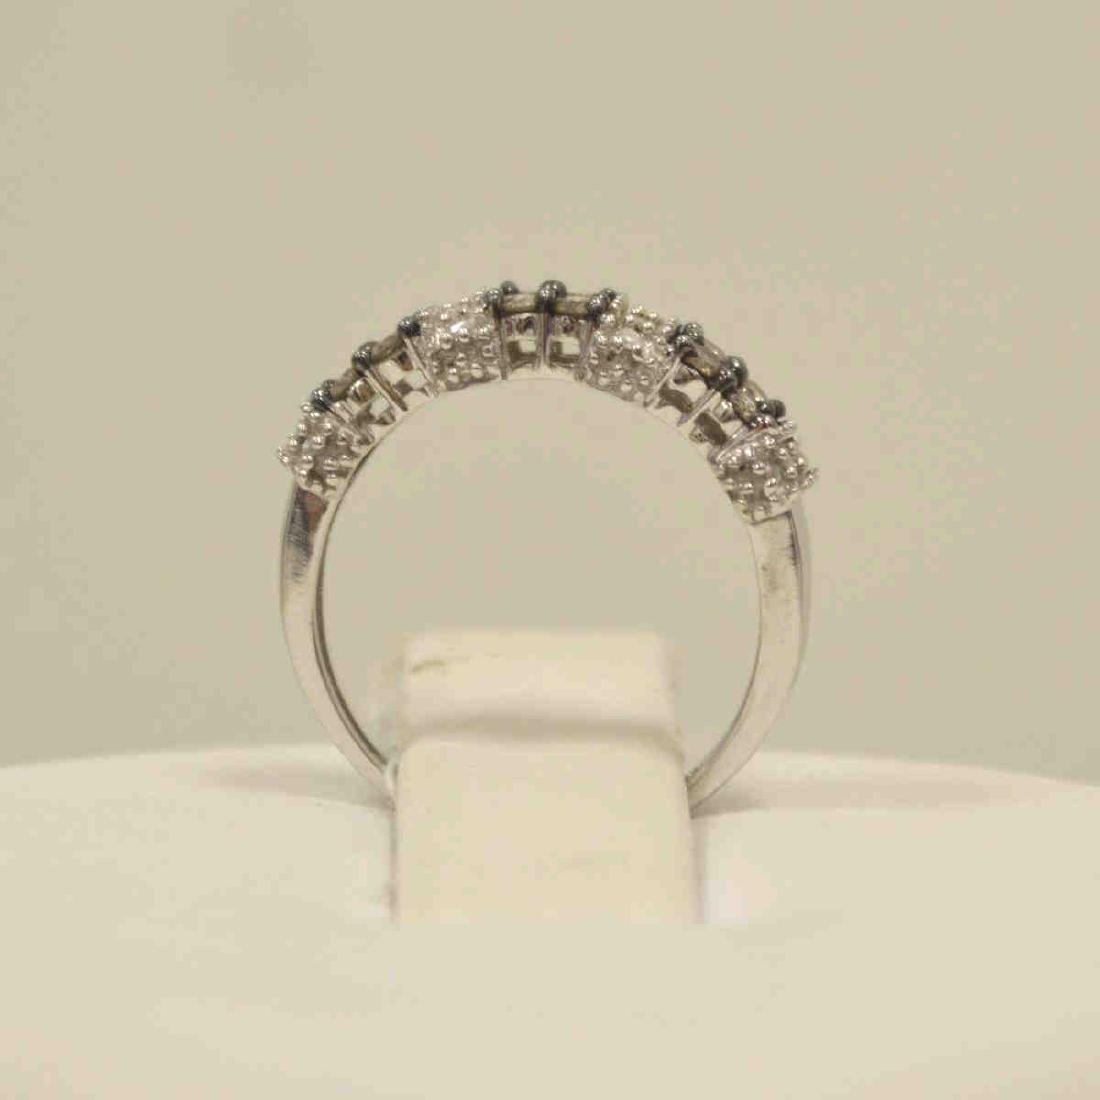 10kt white gold diamond fashion band - 3